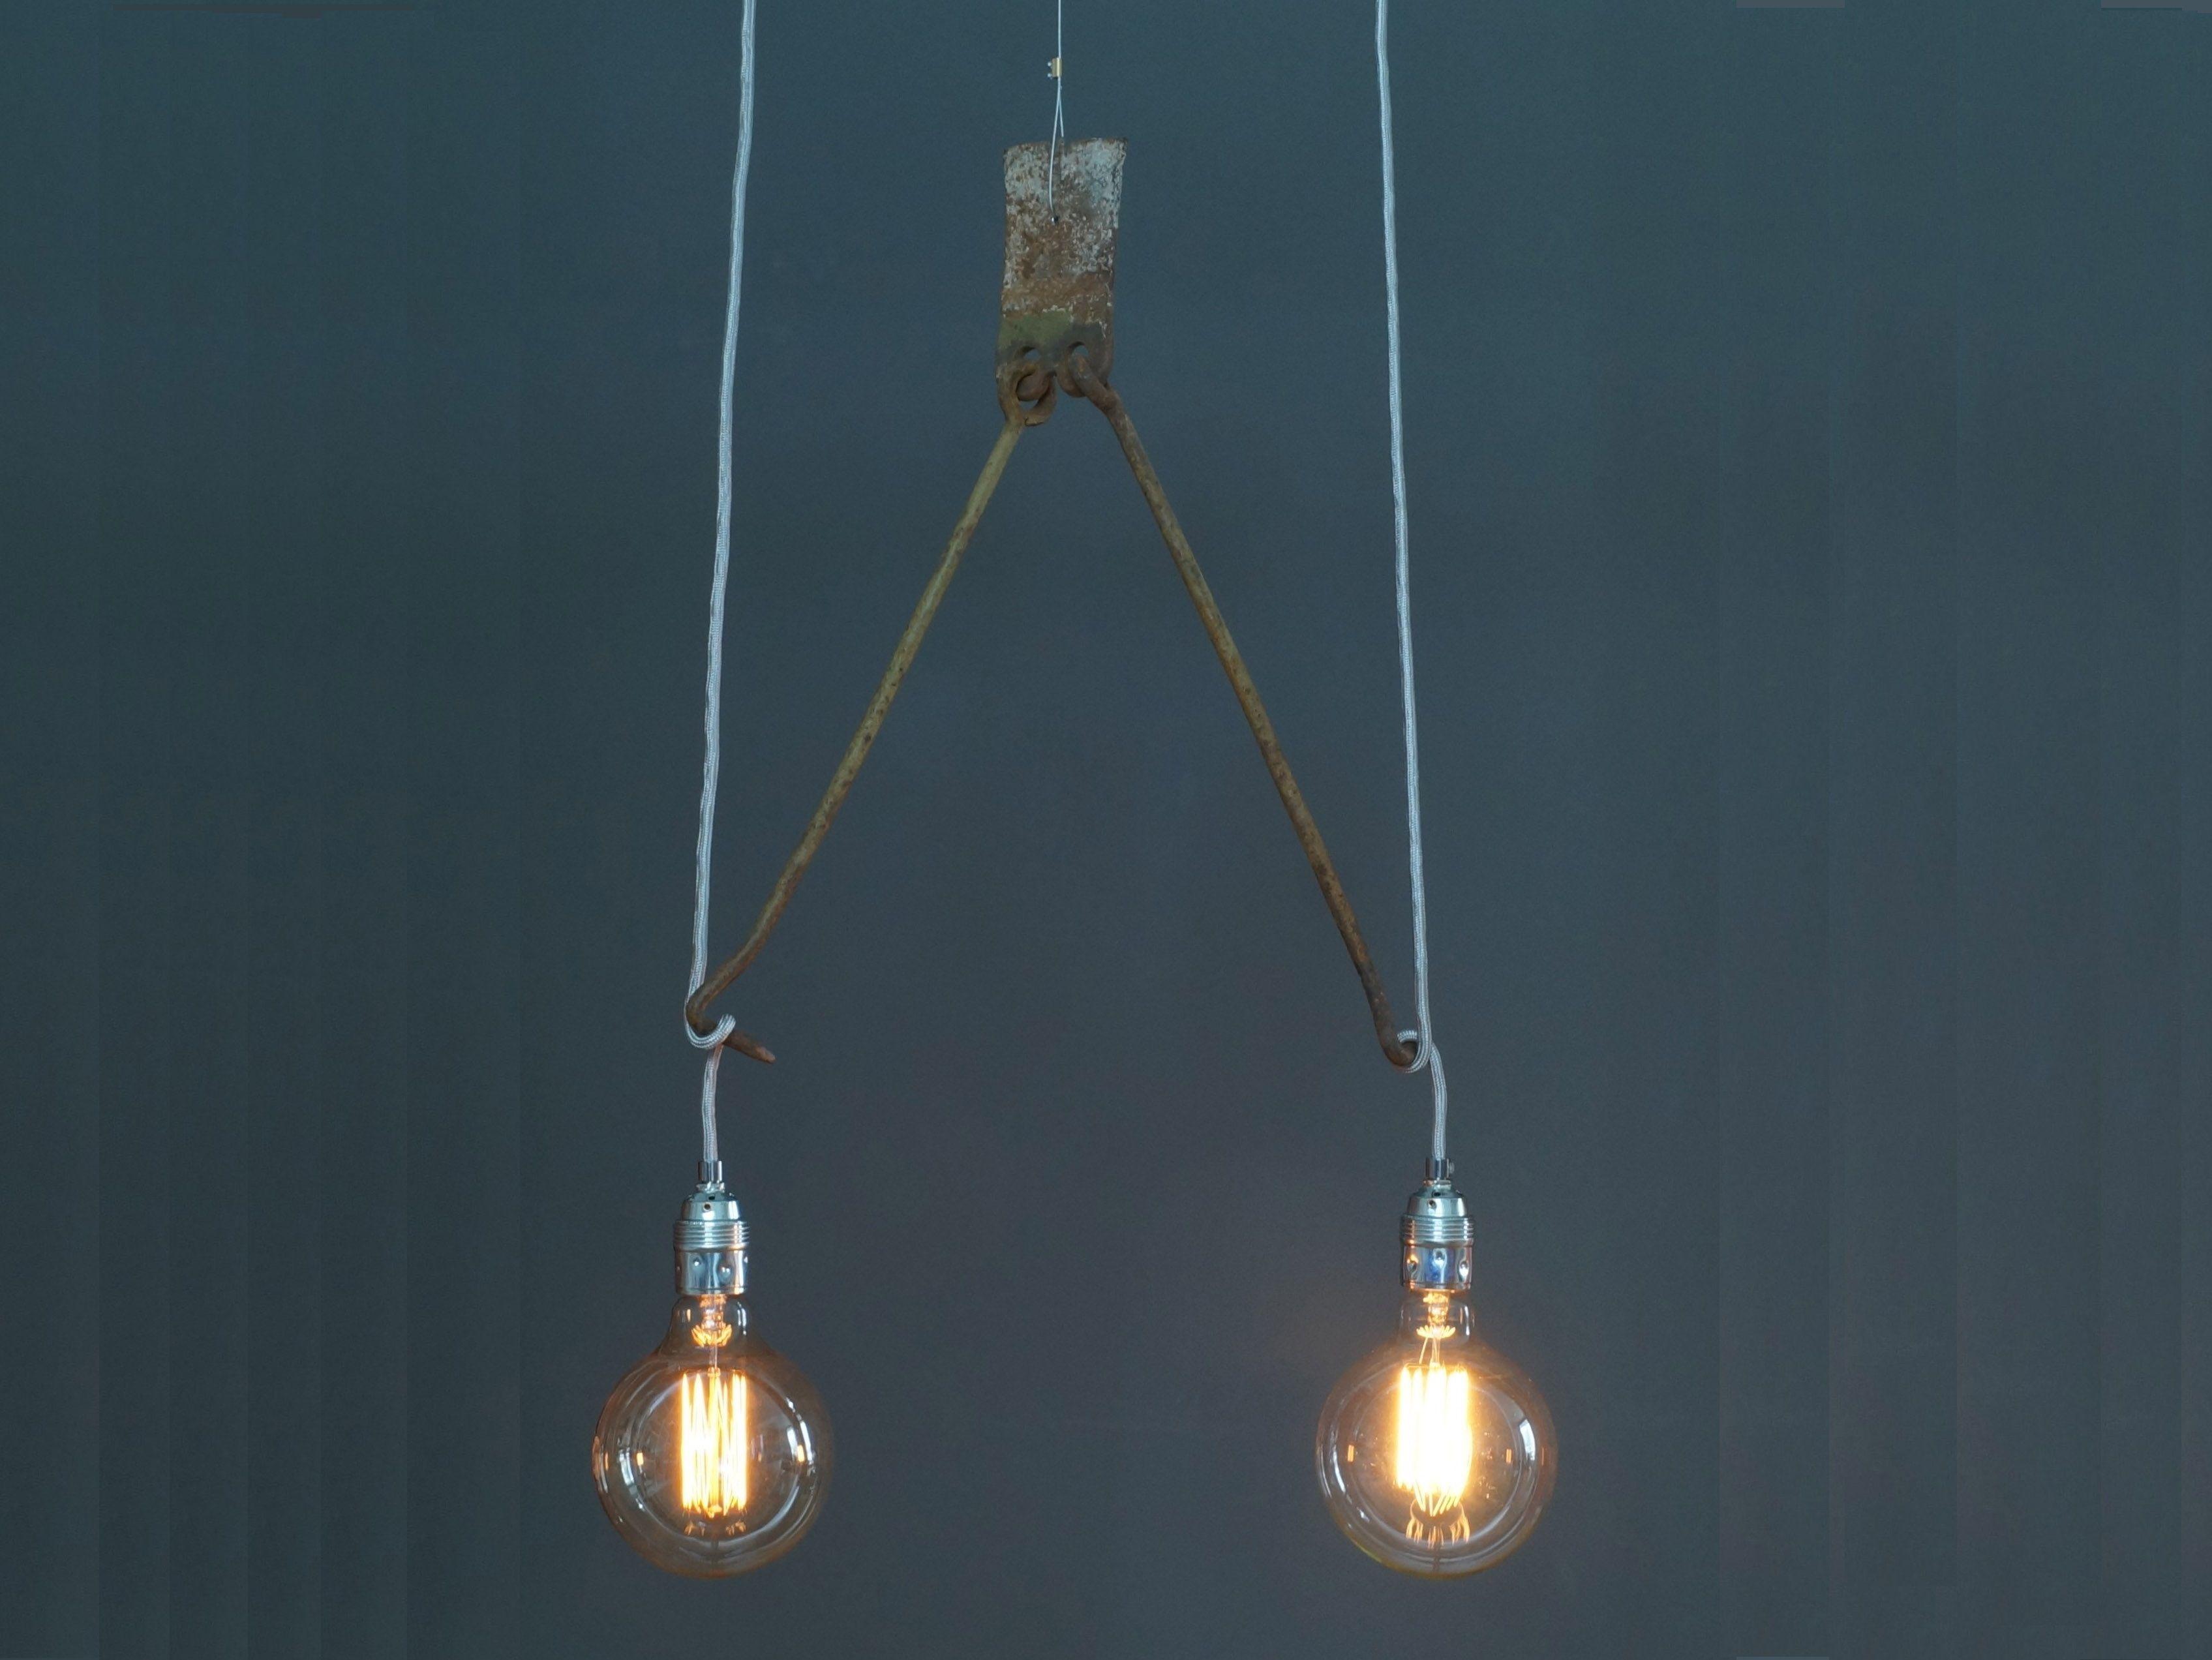 Edison Hangelampe Gancio Incl 2 Gluhbirnen Einzelstuck